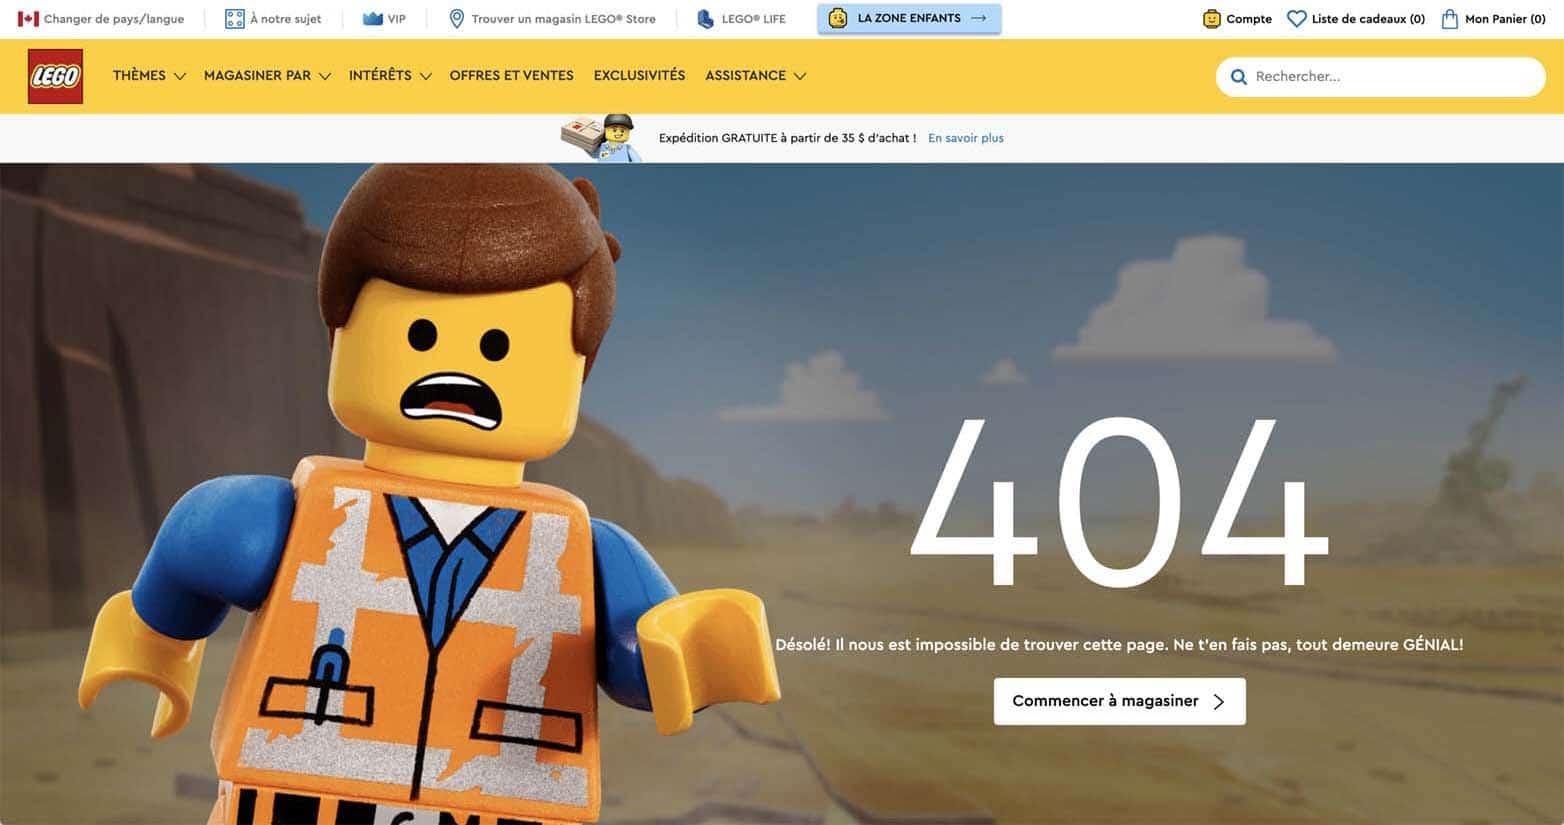 La page d'erreur 404 de Lego